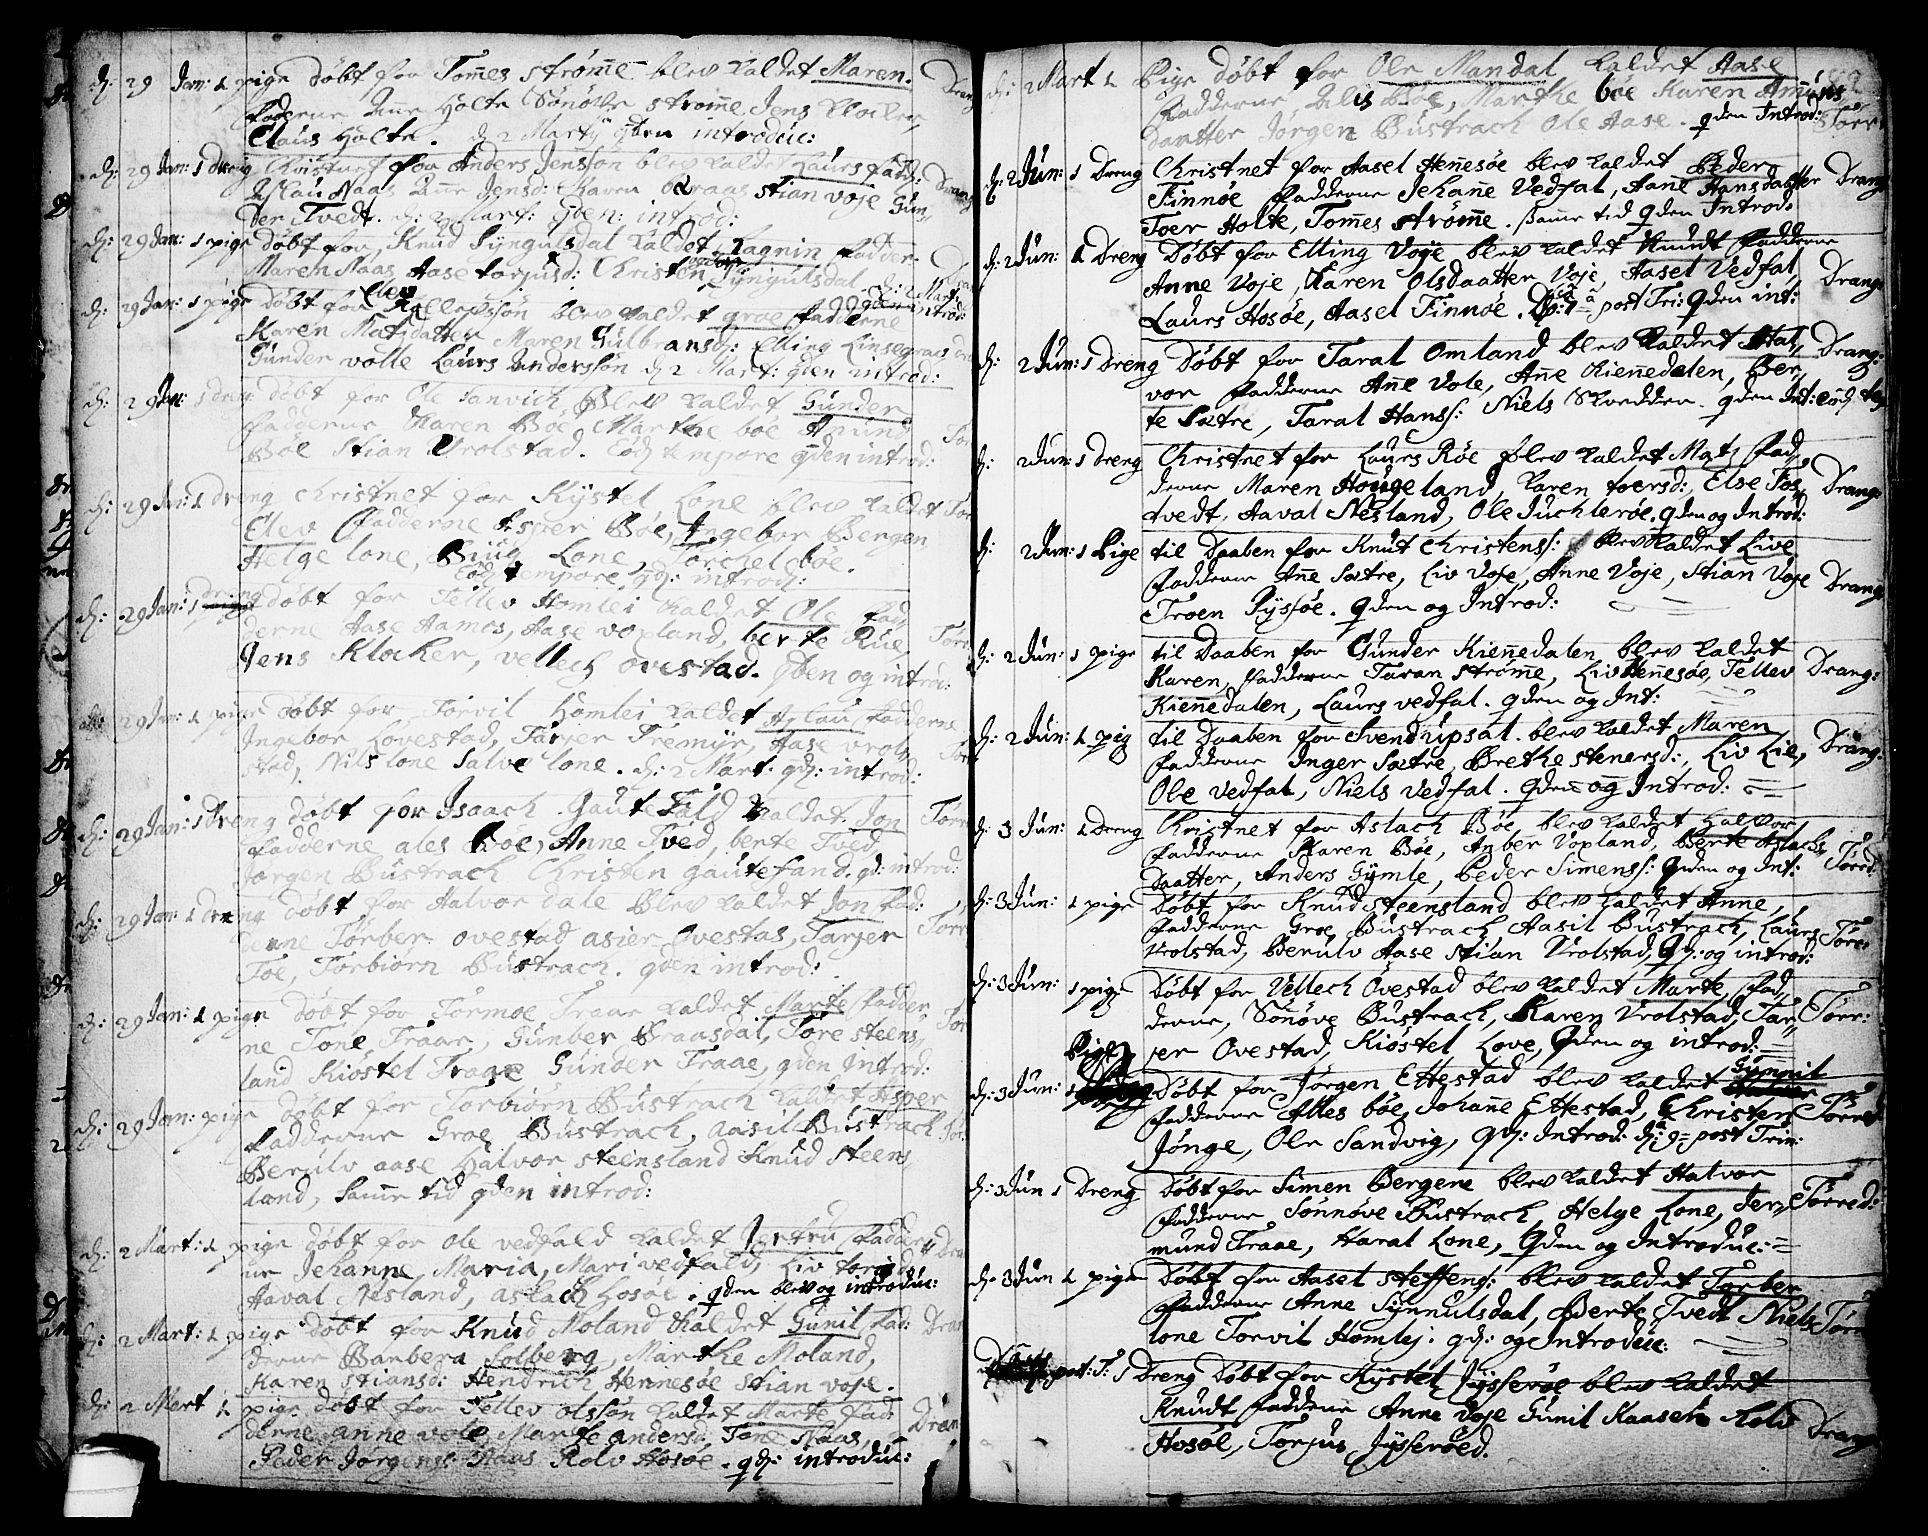 SAKO, Drangedal kirkebøker, F/Fa/L0001: Ministerialbok nr. 1, 1697-1767, s. 82